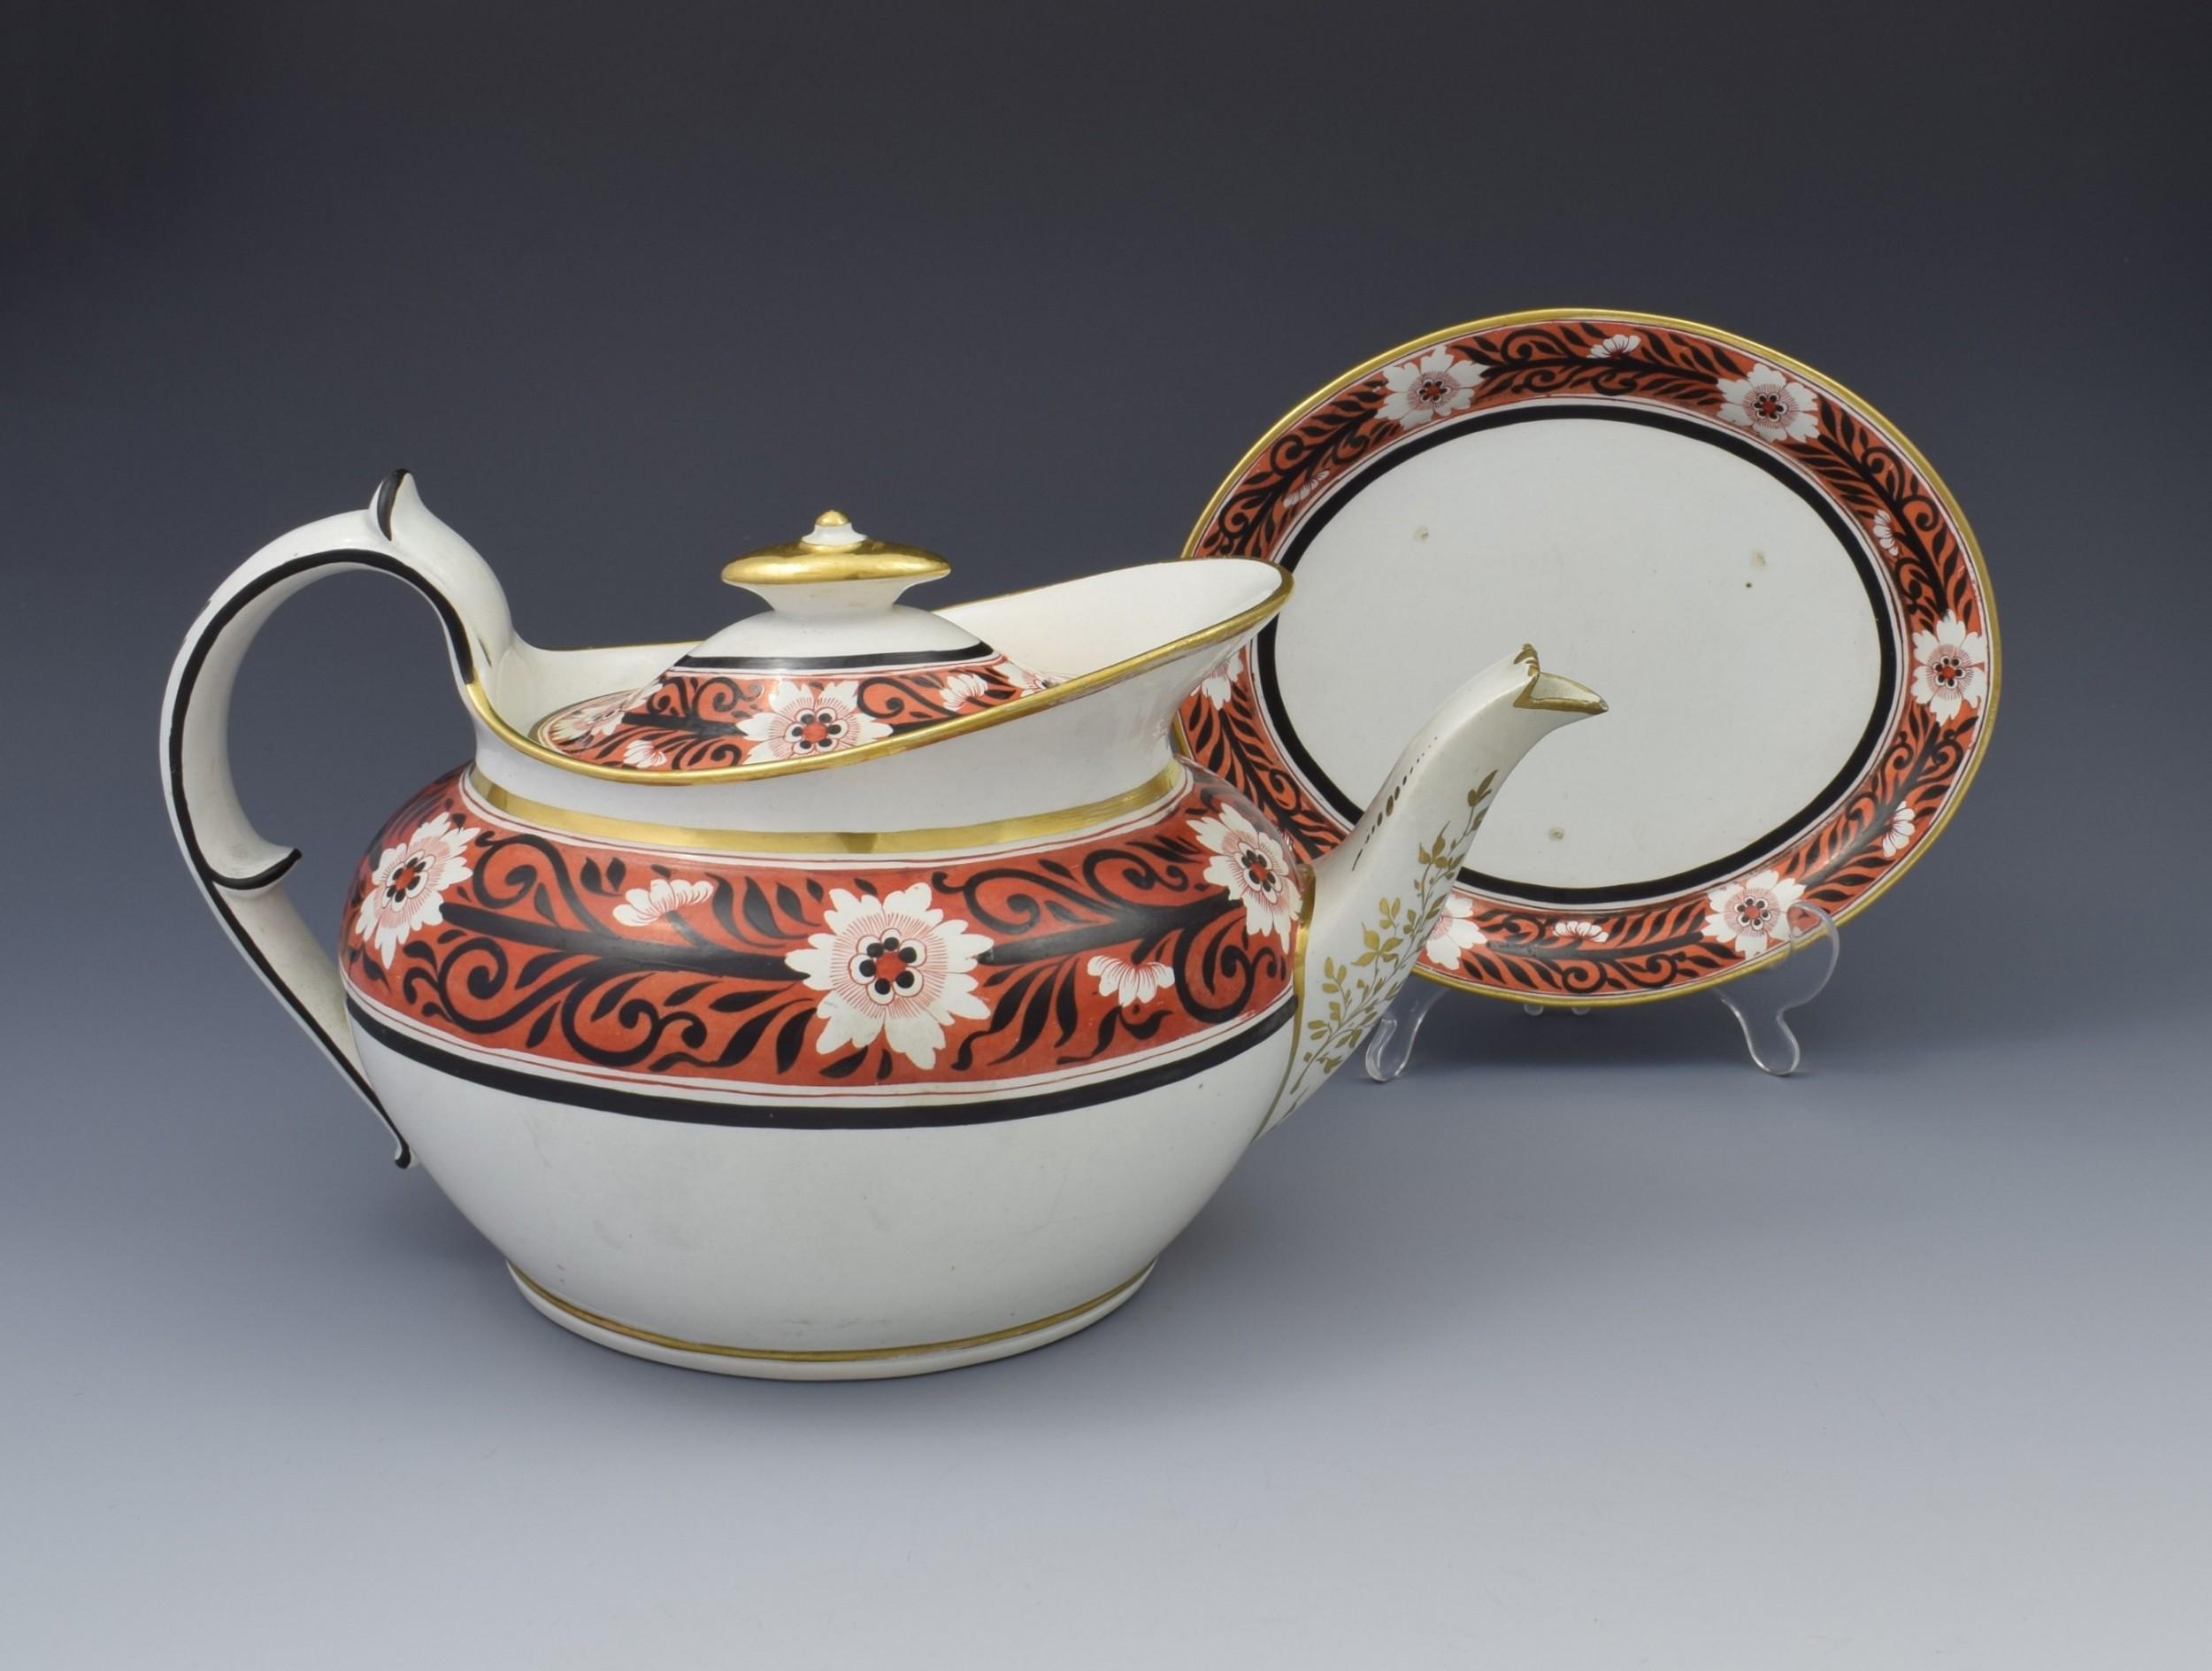 regency miles mason low oval porcelain teapot stand c1810